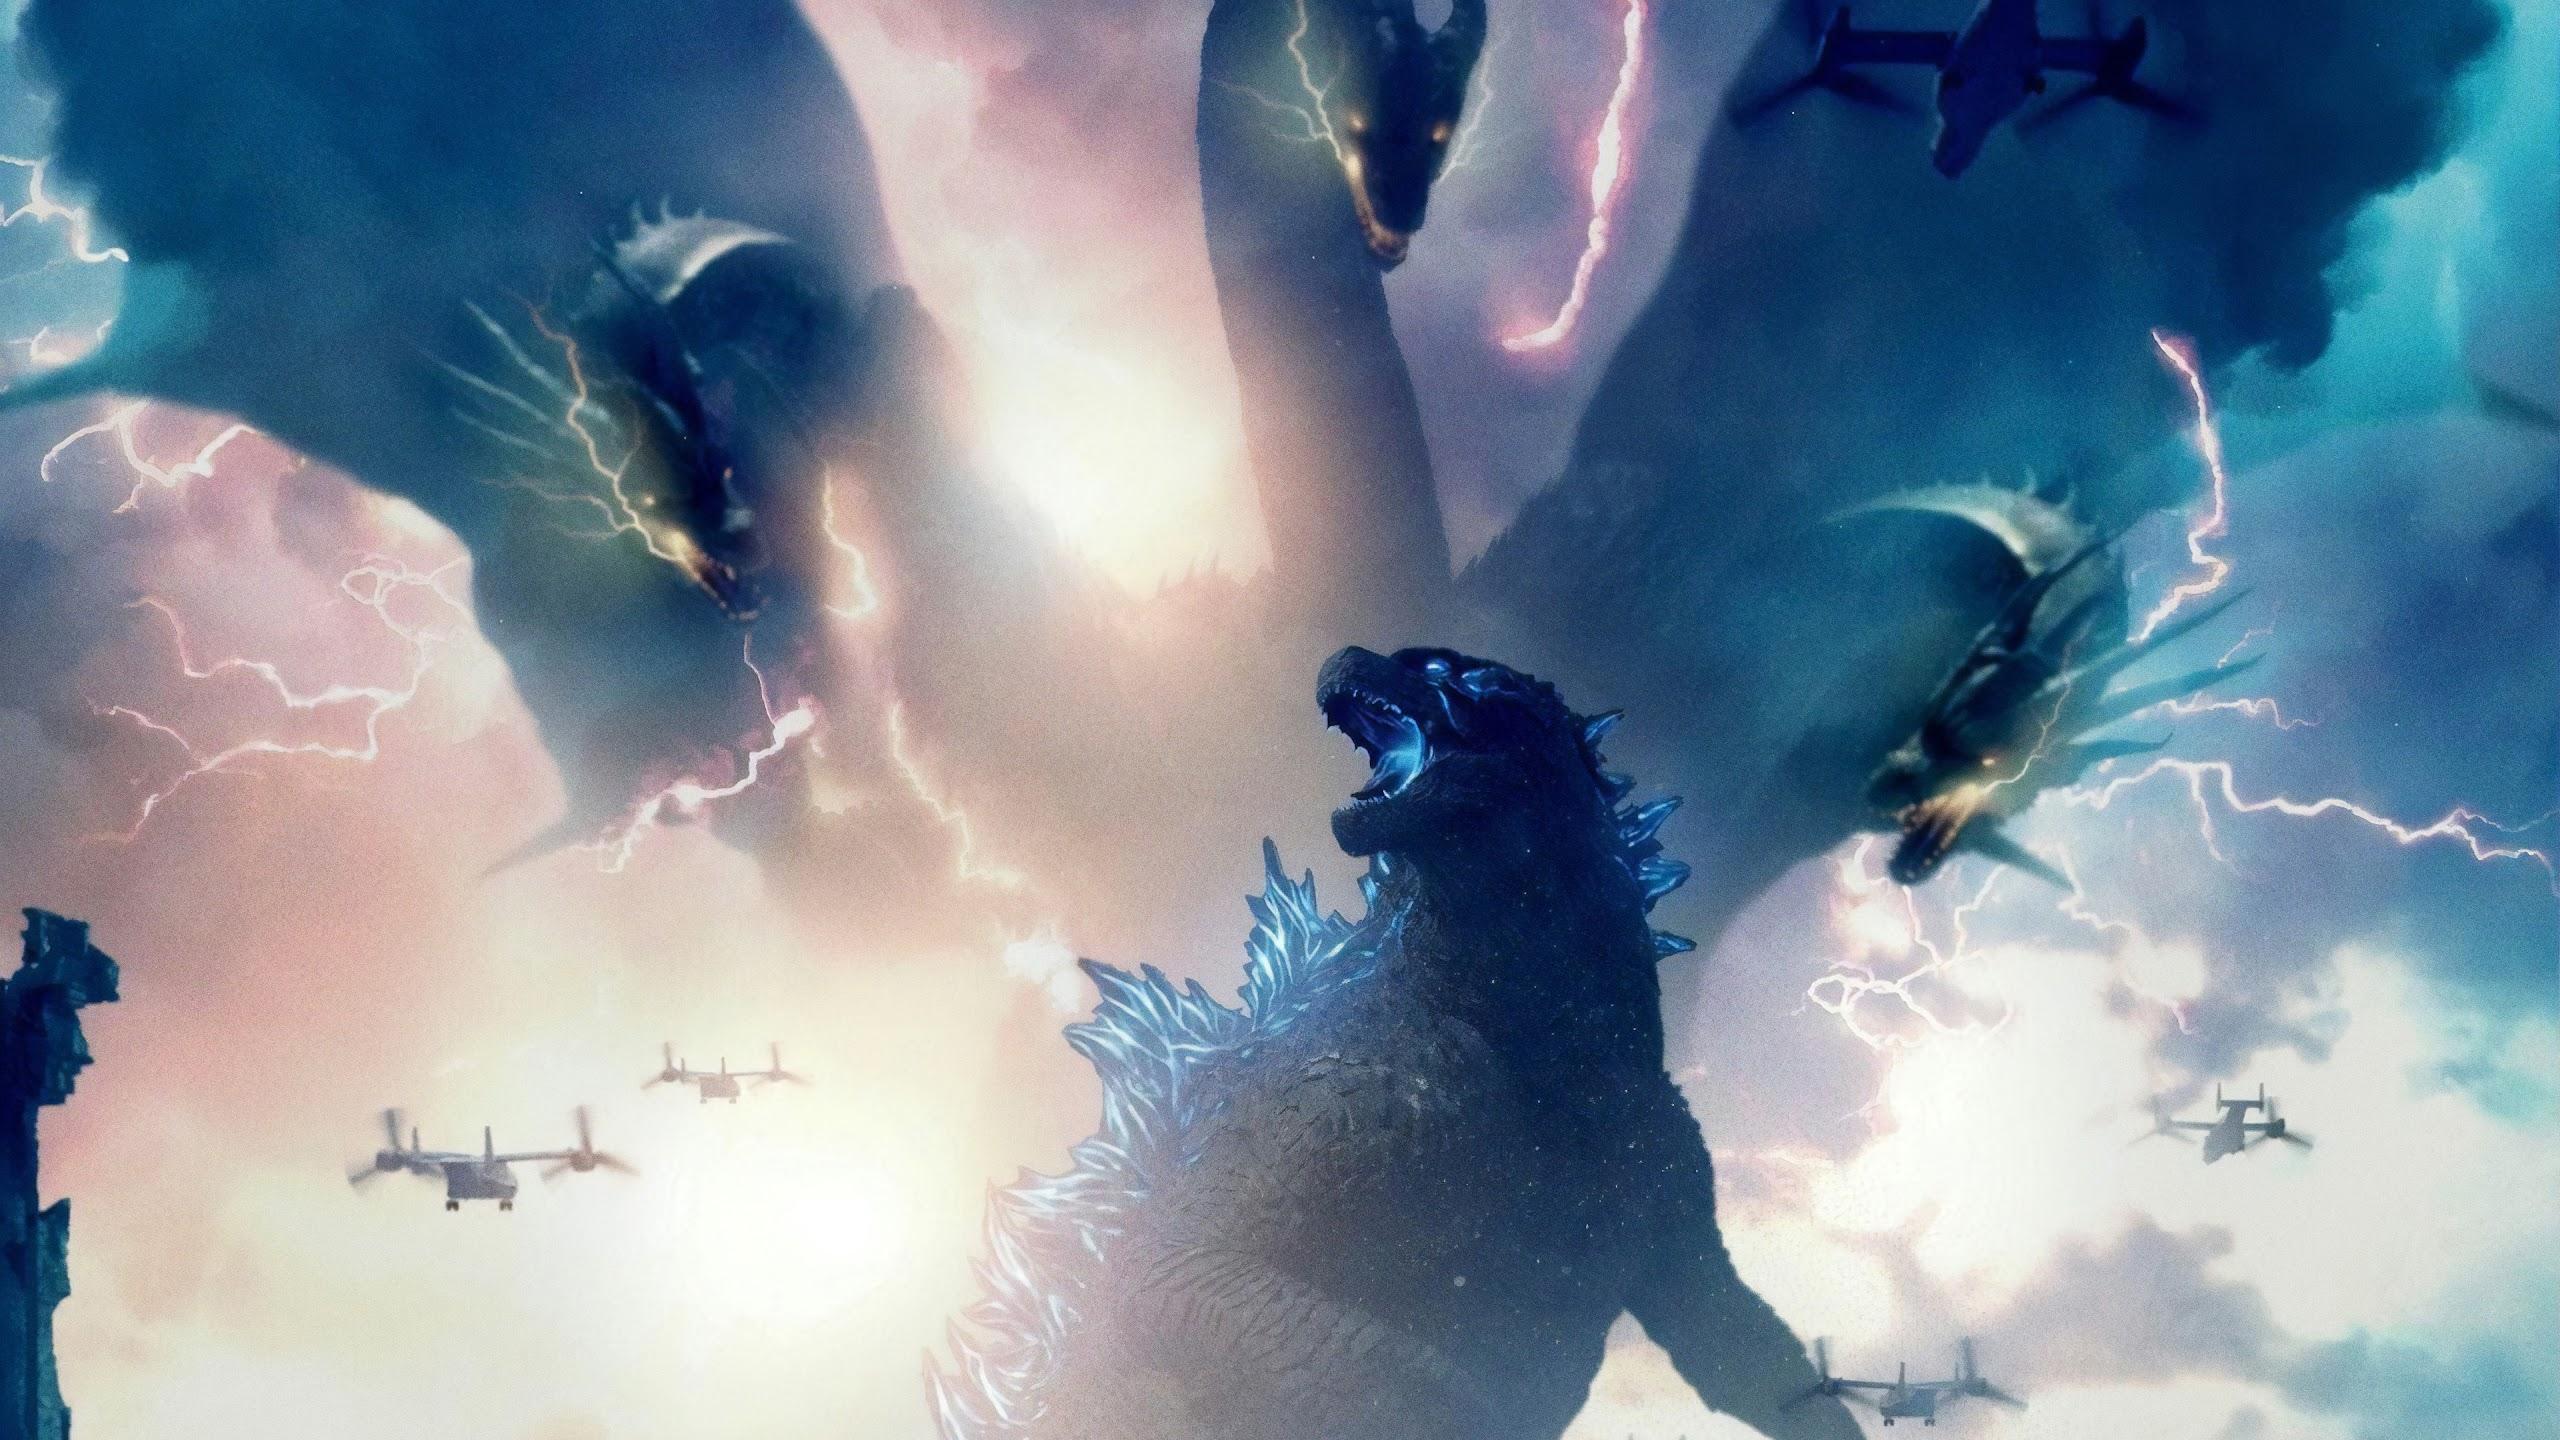 Godzilla Vs King Ghidorah Godzilla King Of The Monsters 4k